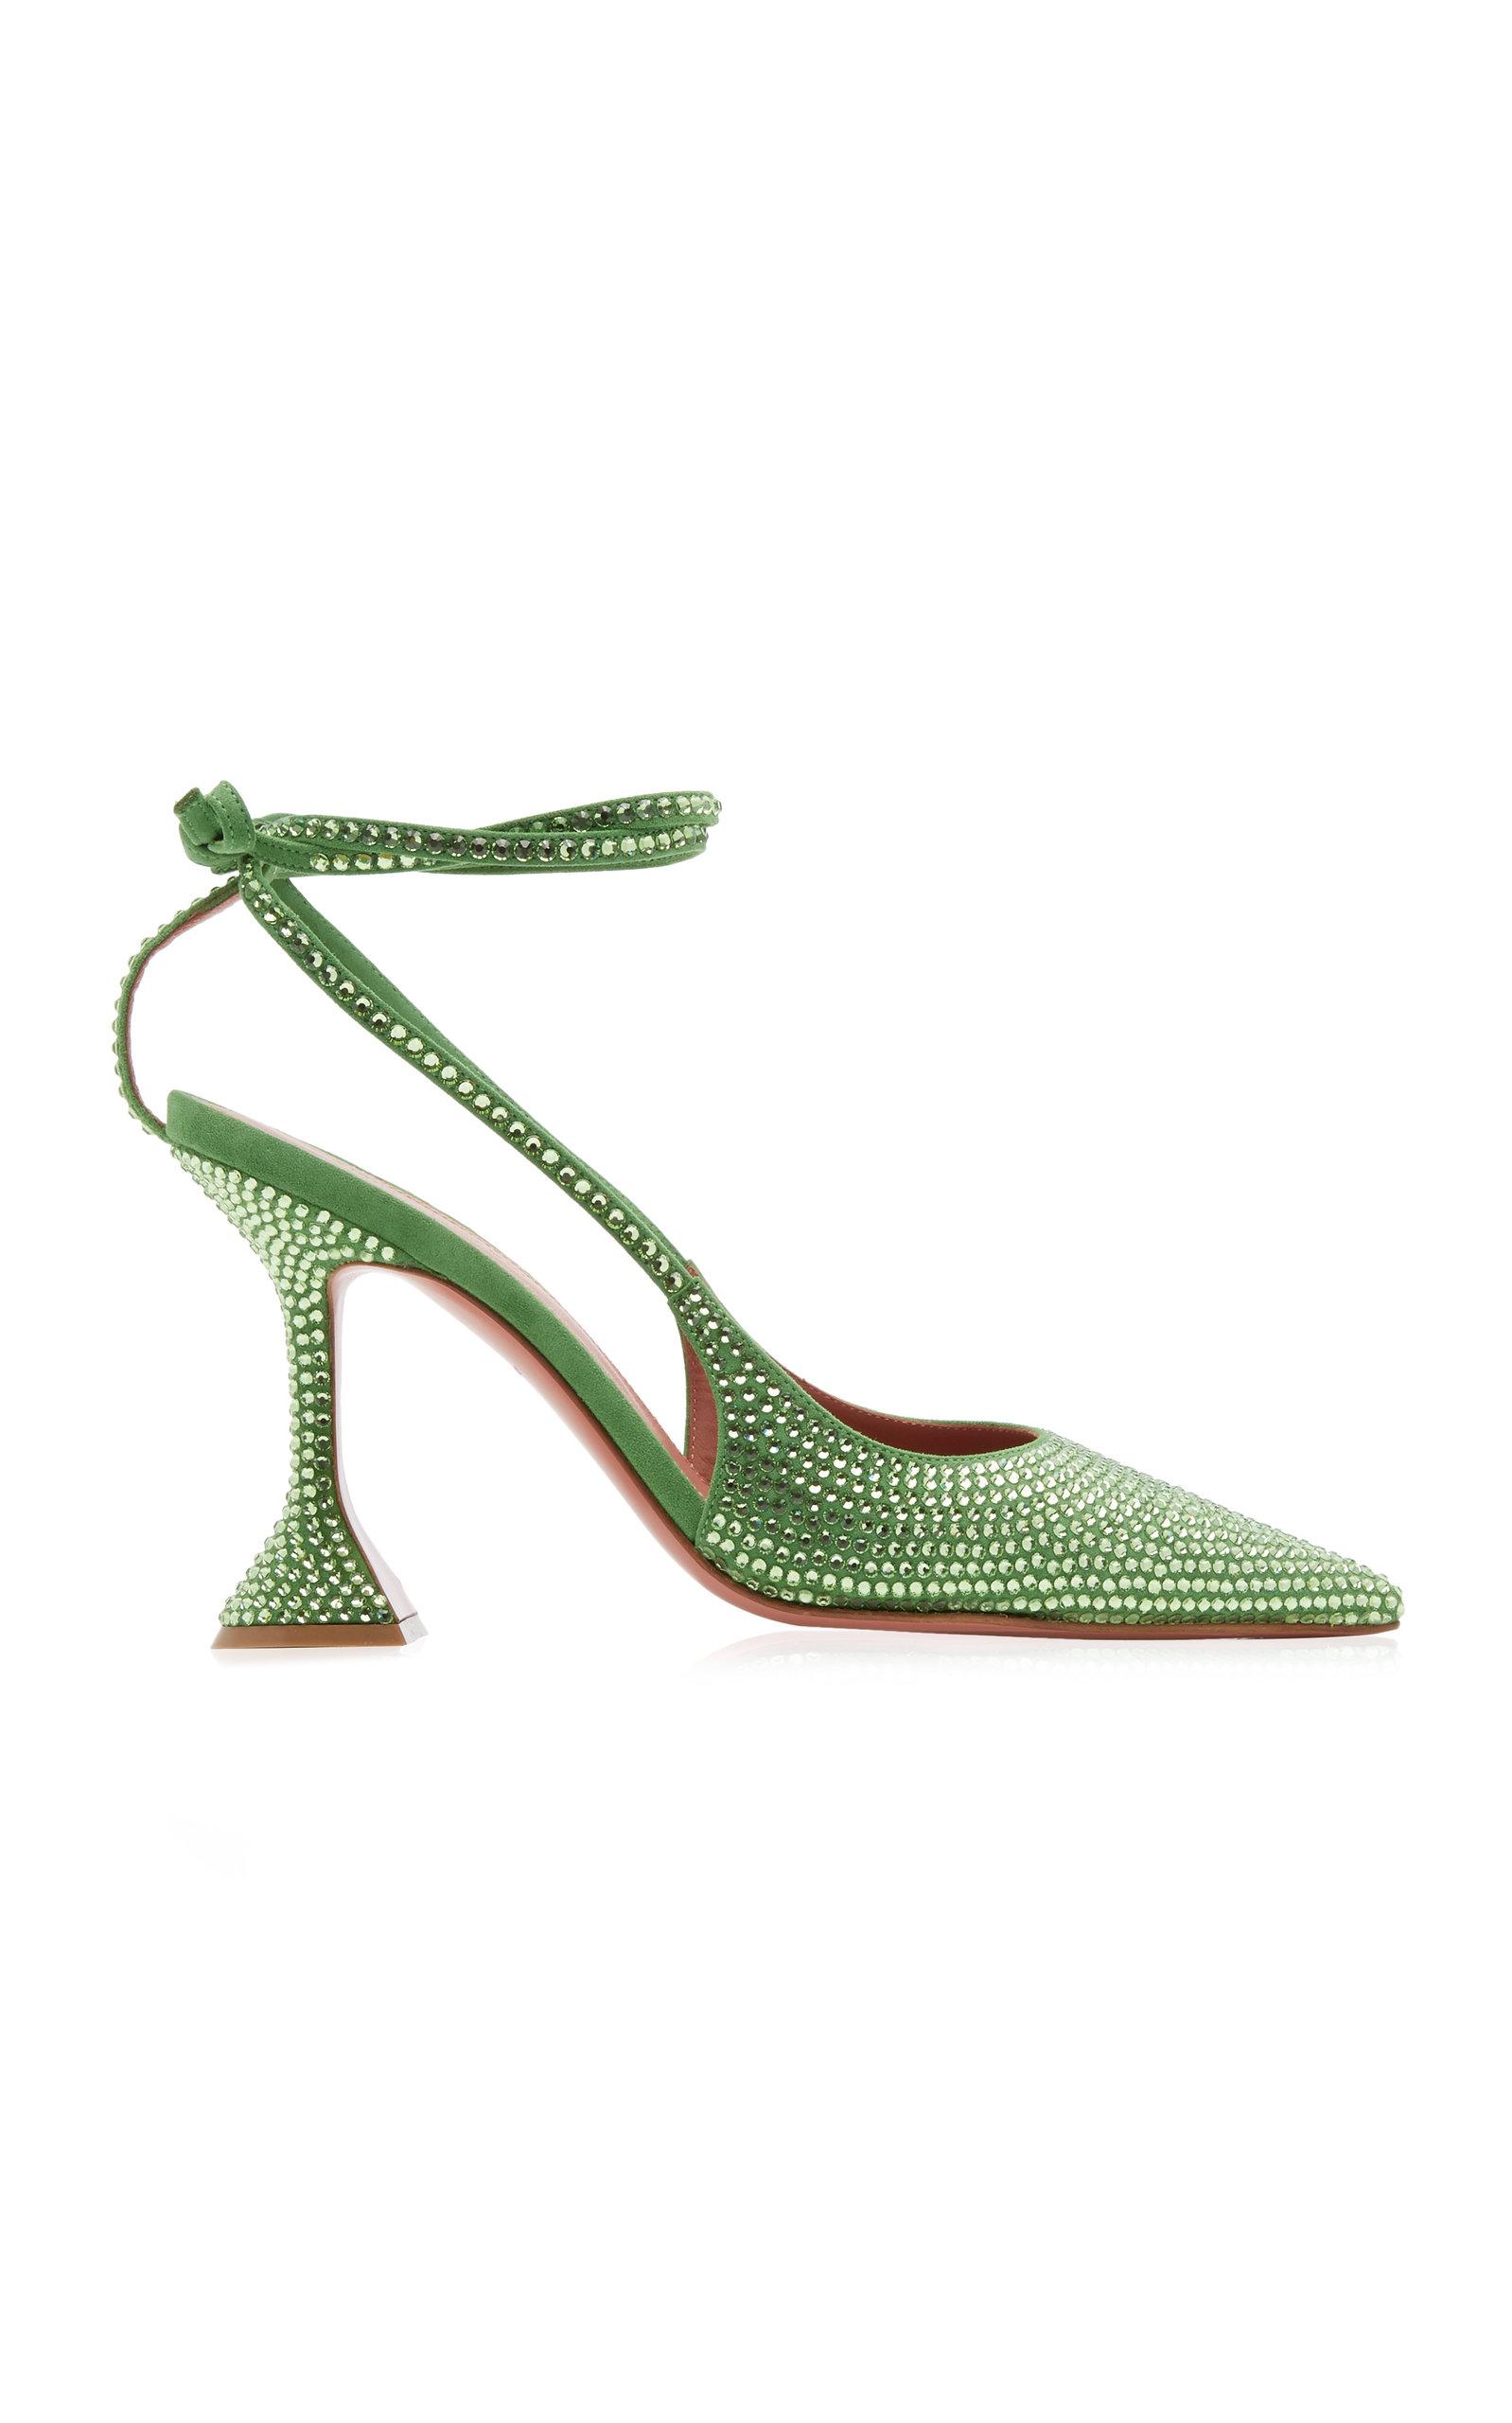 Amina Muaddi – Women's Karma Crystal-Embellished Suede Pumps – Green/red – Moda Operandi